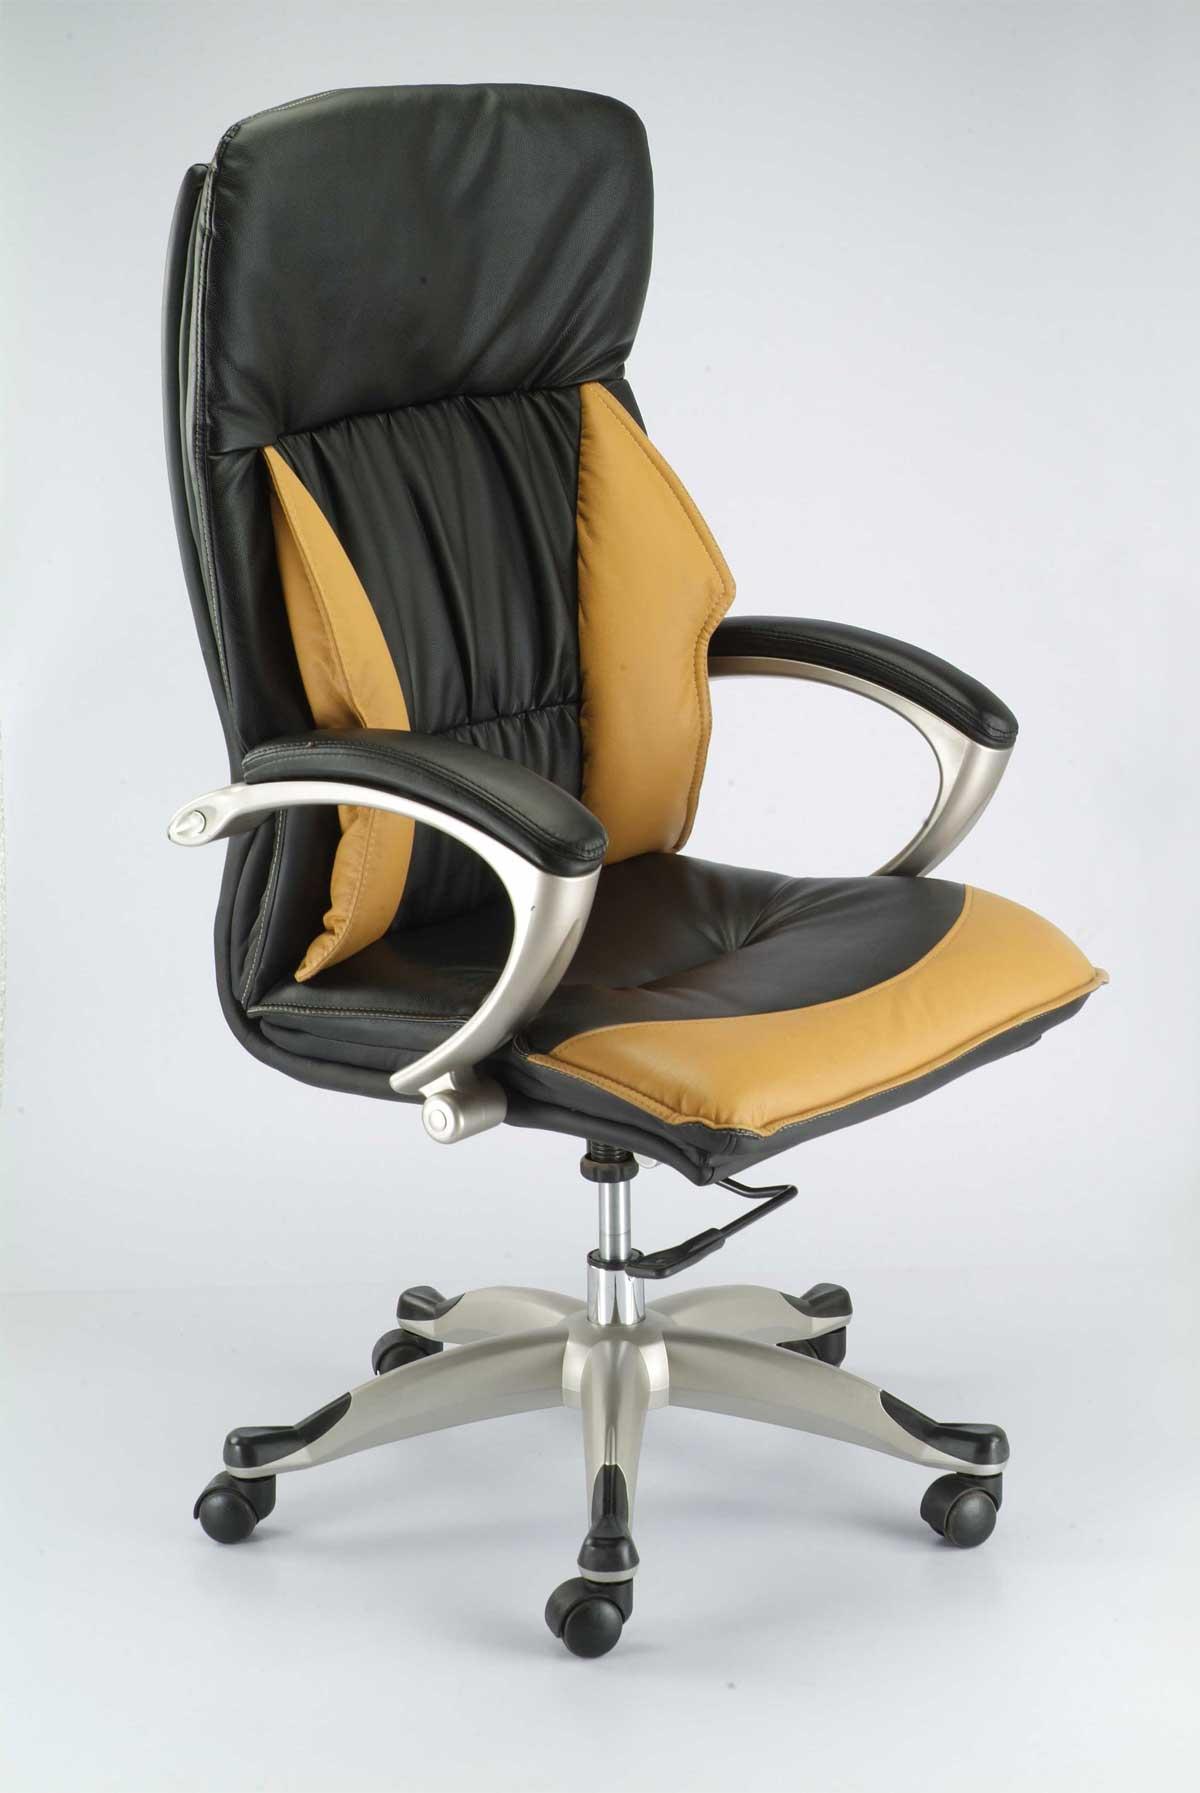 Model Office Furniture Suppliers Surat Archives  Spandan Blog Site